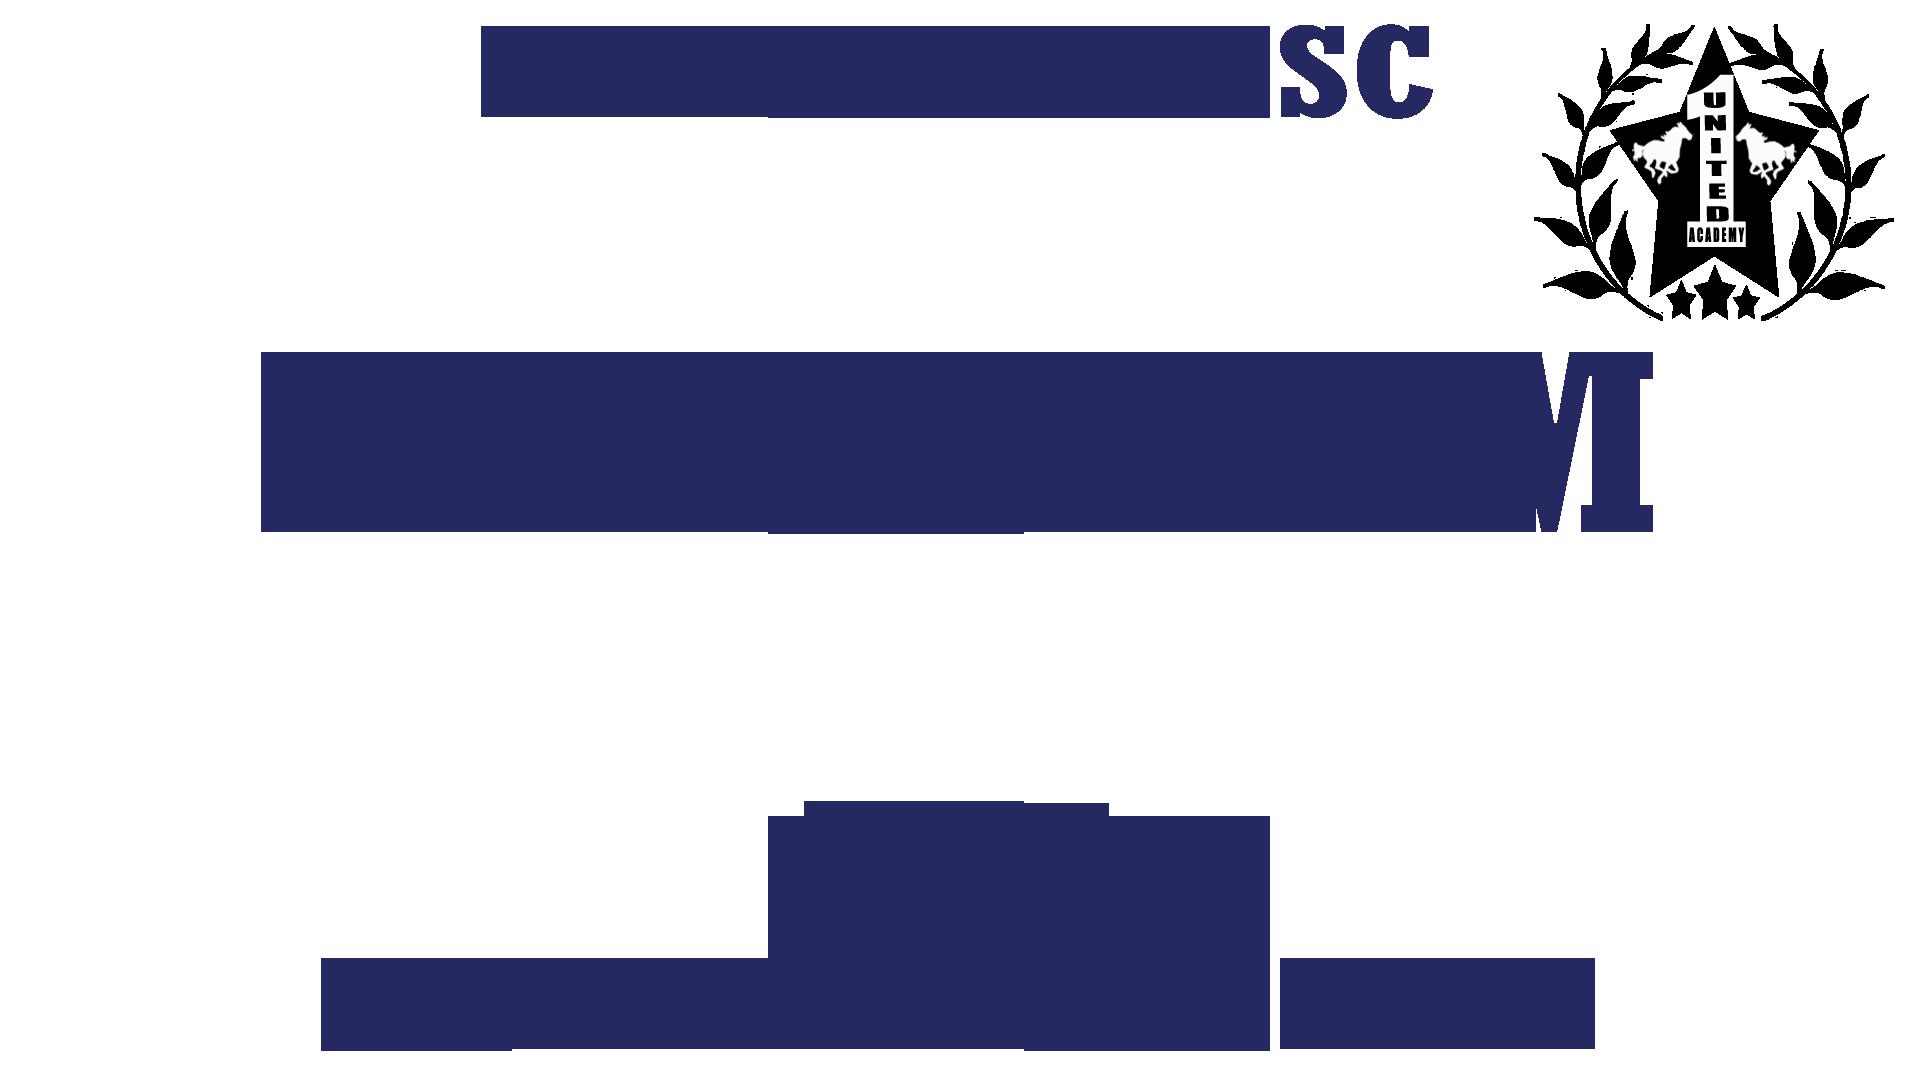 TNPSC coaching center for group 1 main exam in chennai